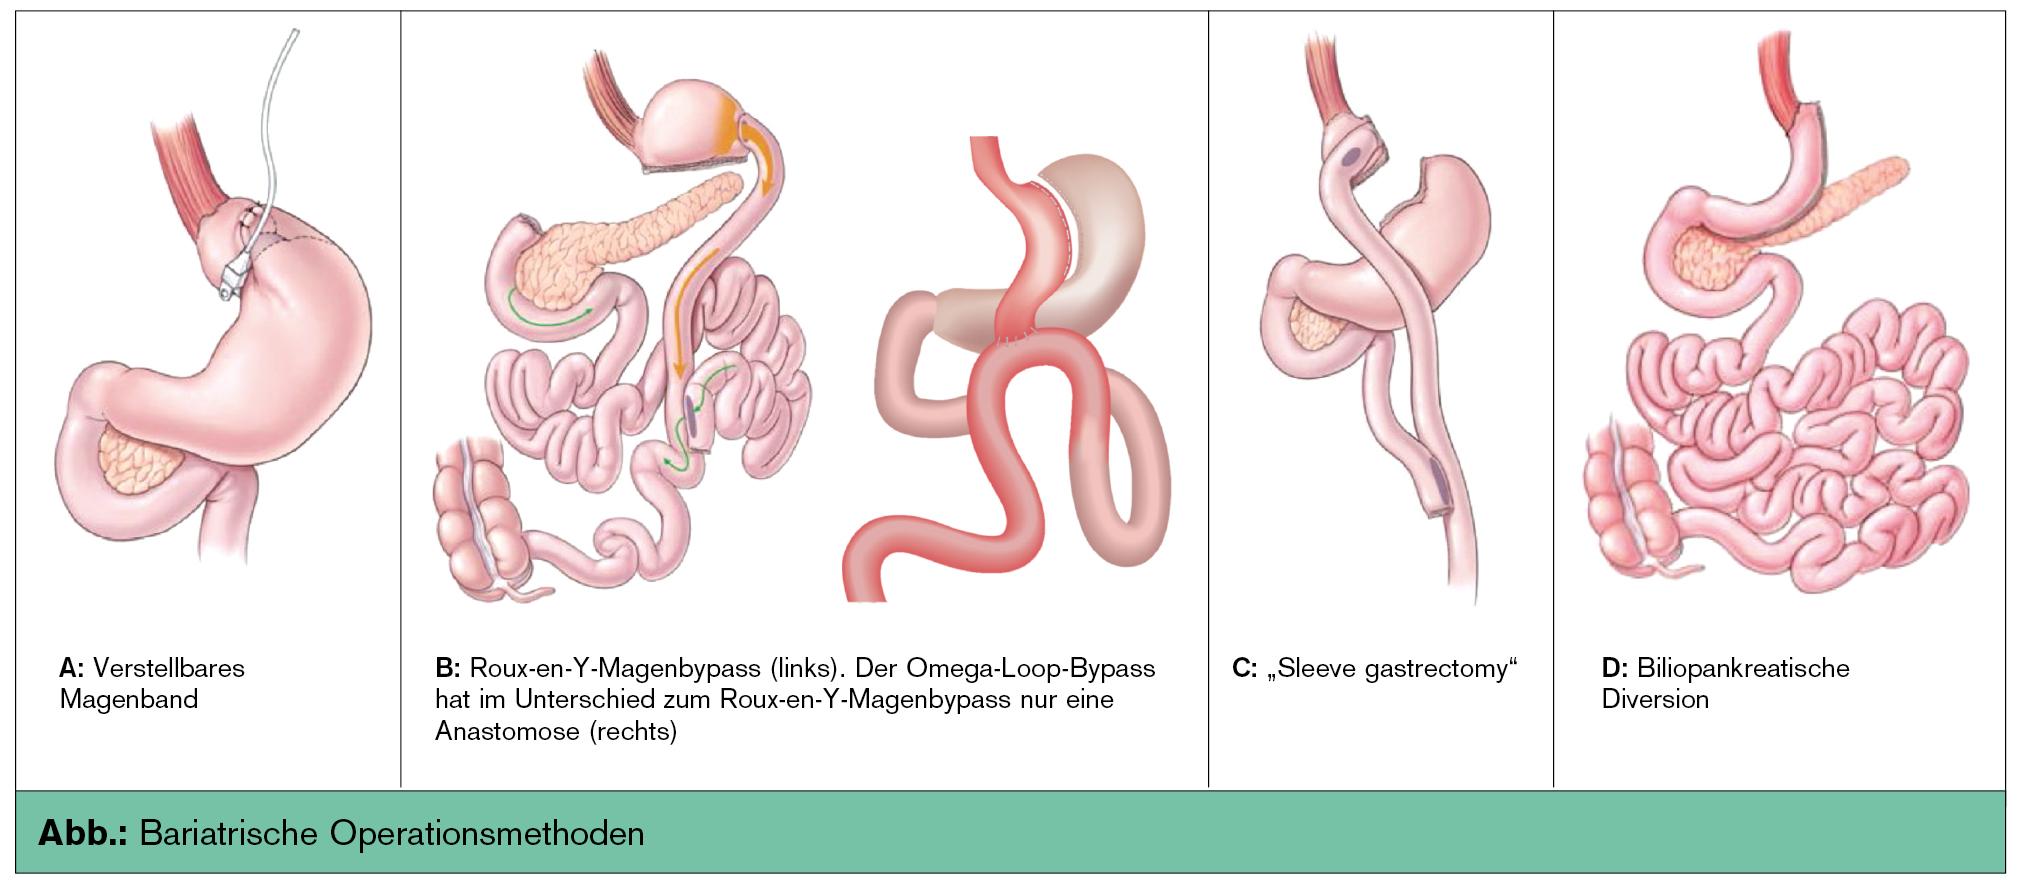 Update Adipositaschirurgie   Universum Innere Medizin   MedMedia